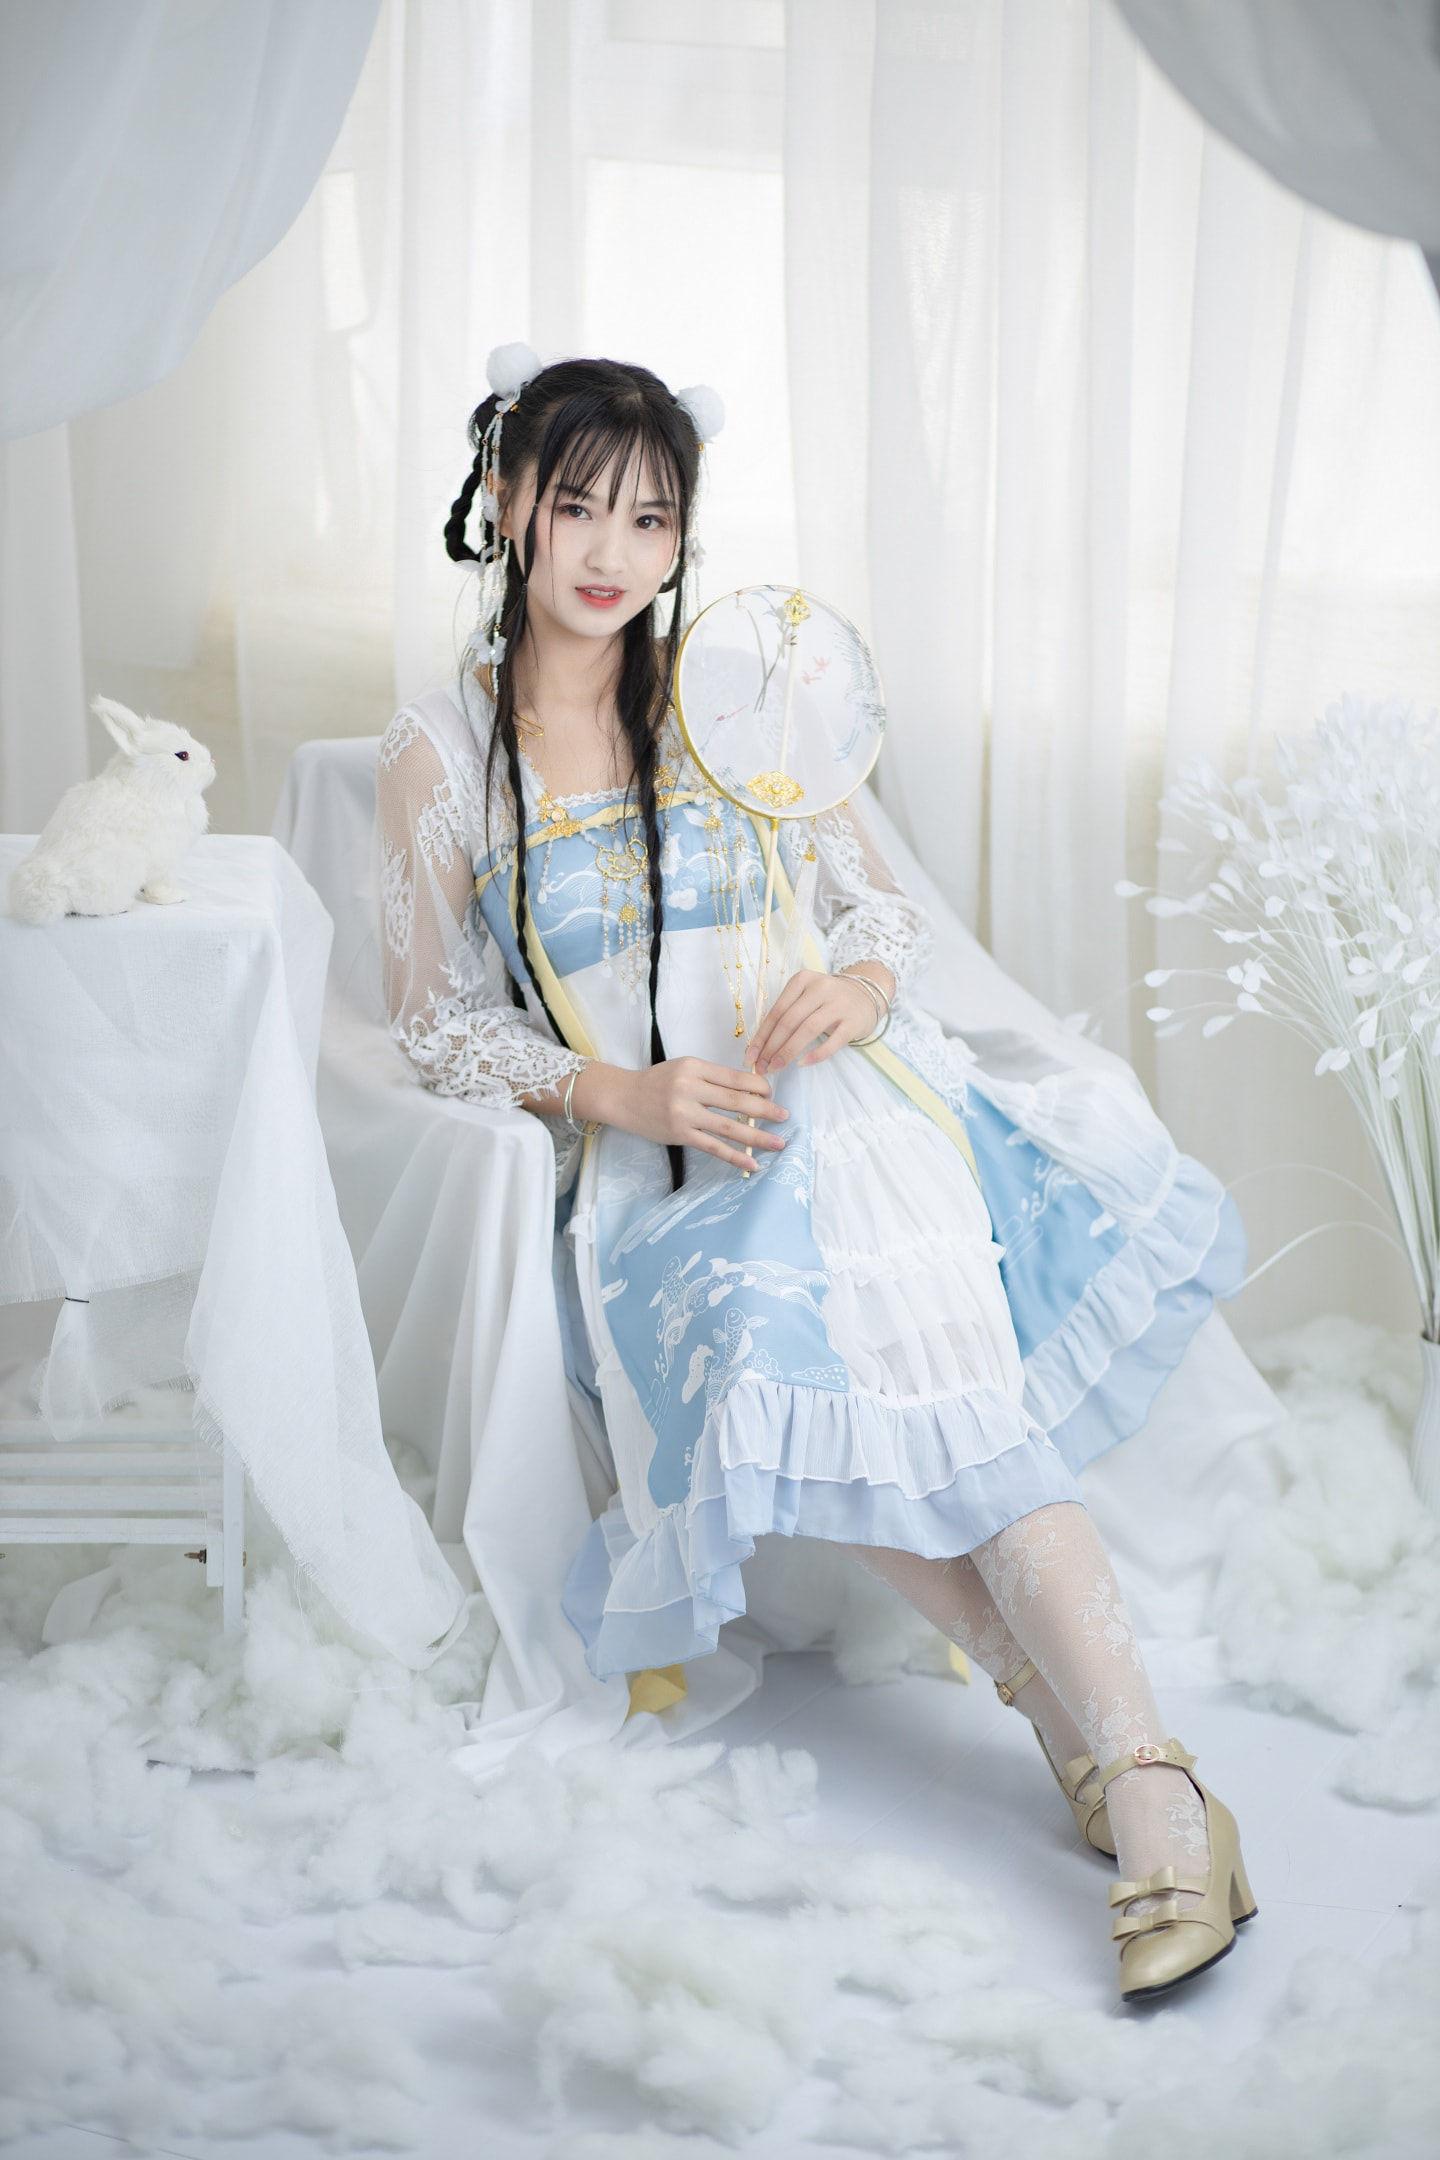 Lolita私影,飘在云端是什么感觉呢